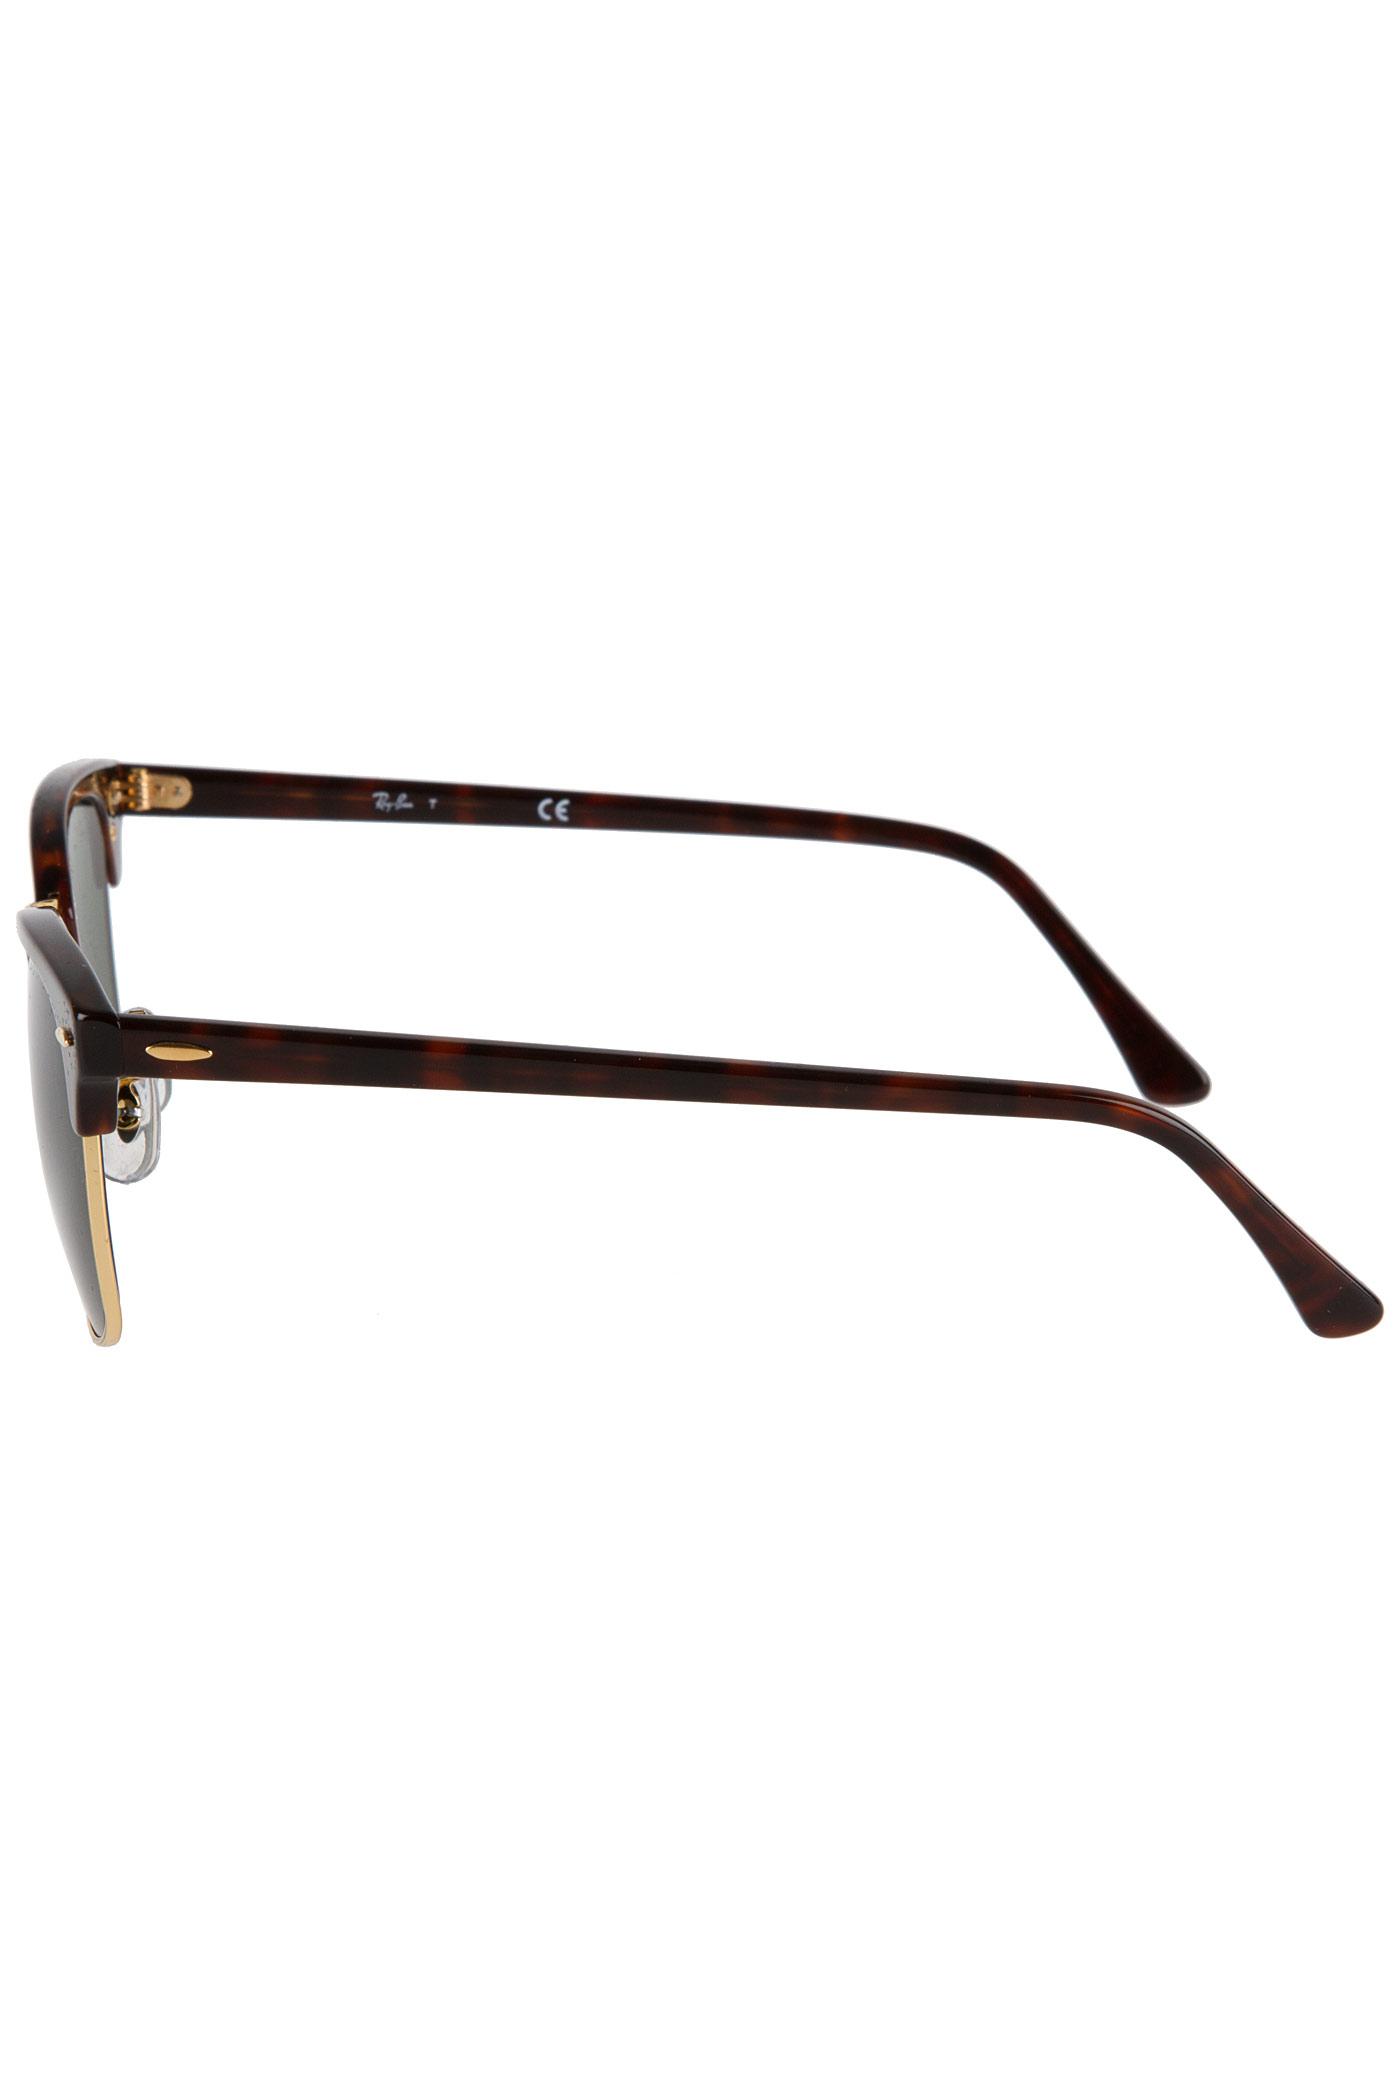 ray ban clubmaster sunglasses 67ea  ray ban clubmaster sunglasses